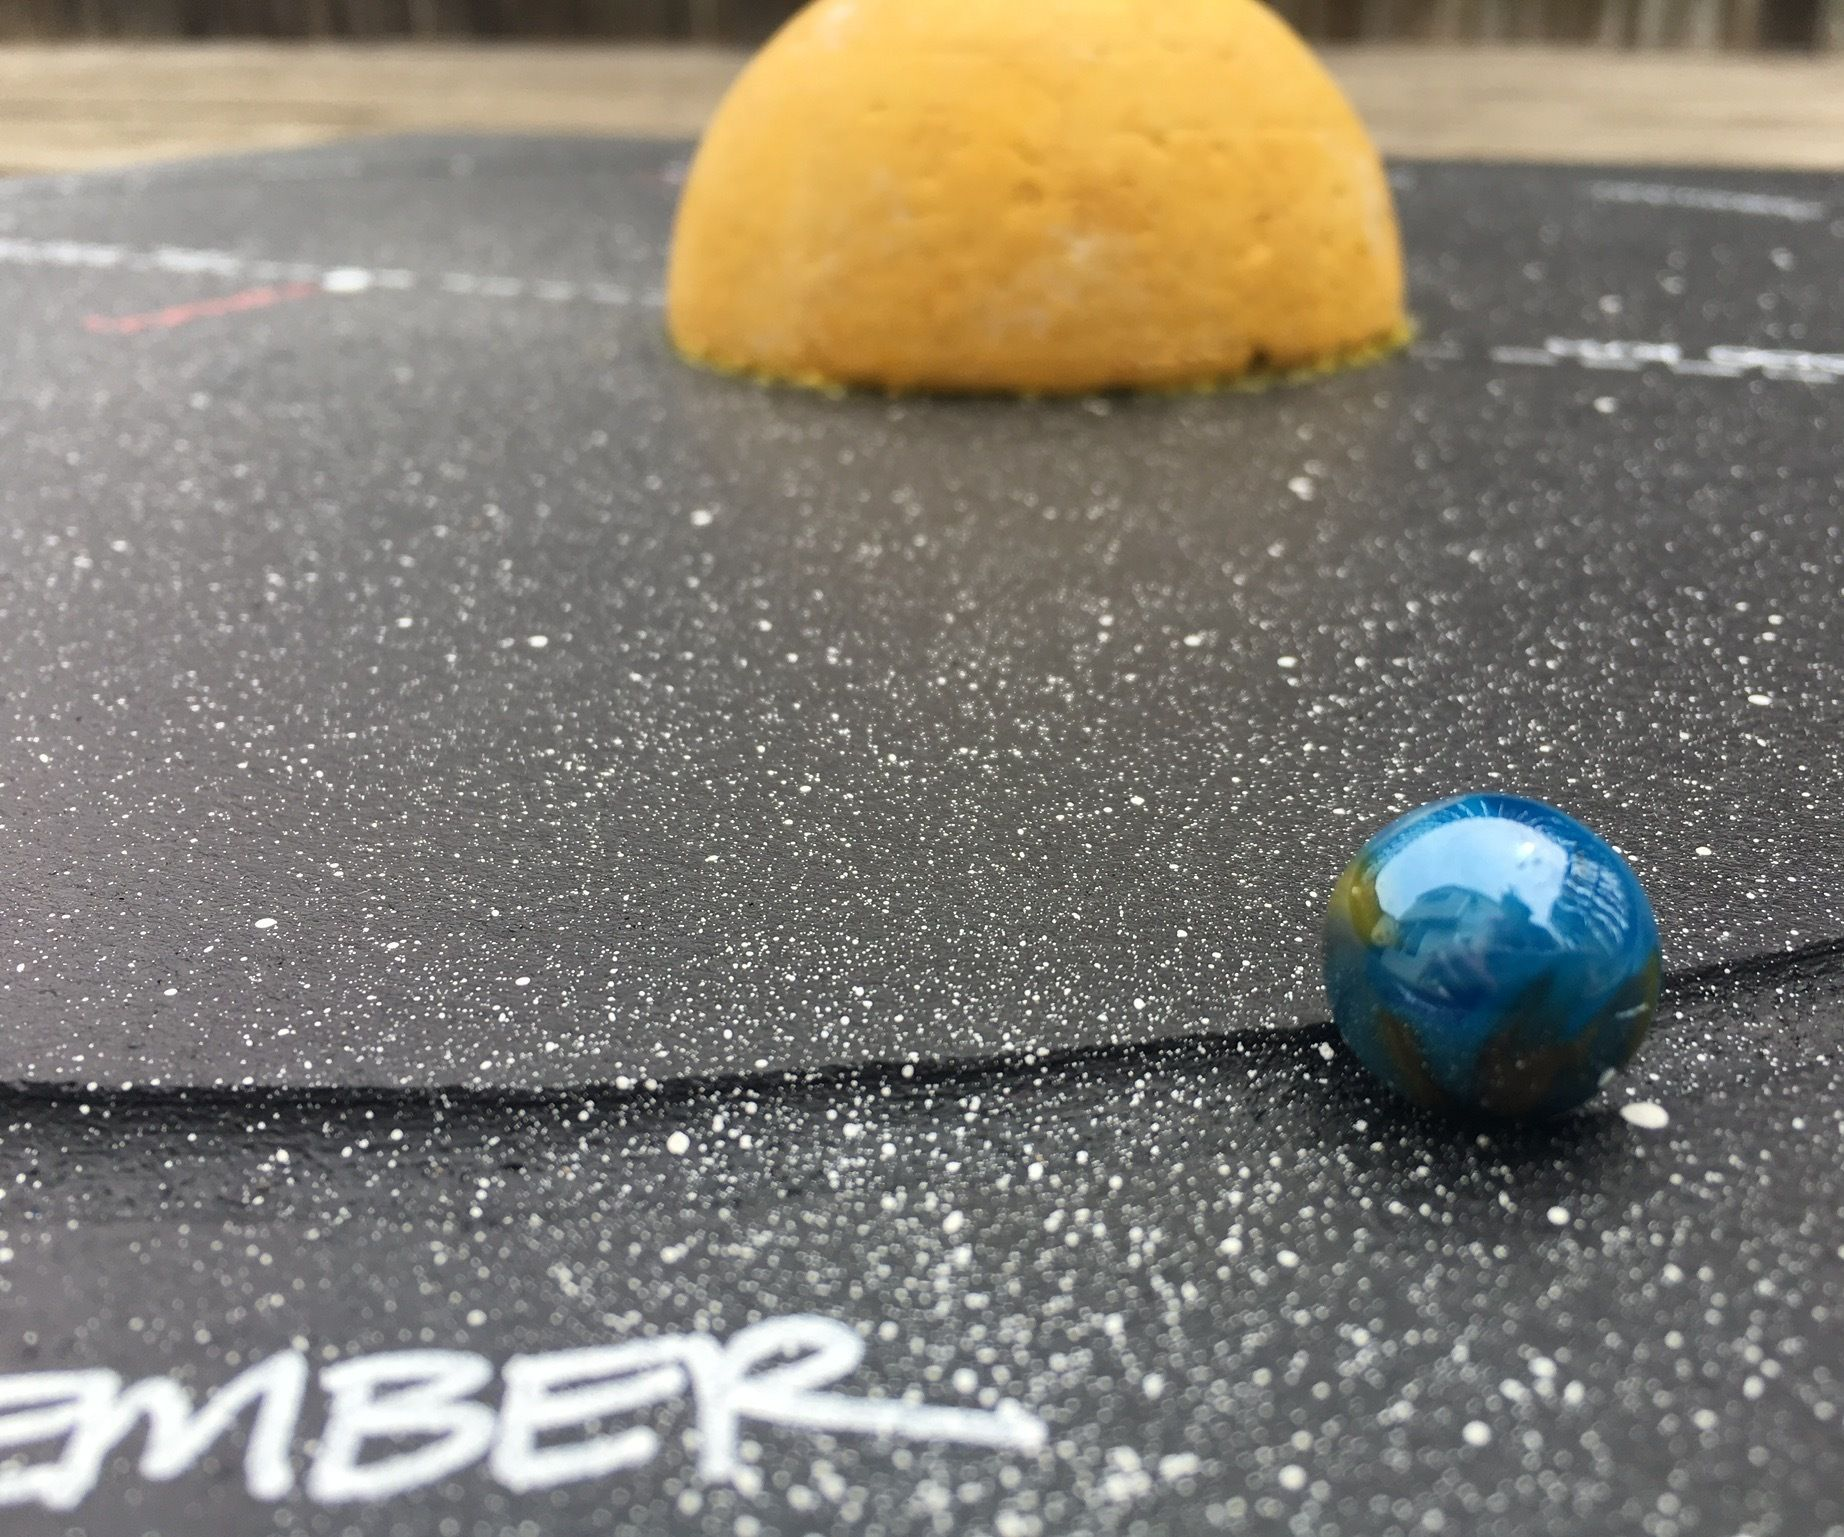 Earth's Elliptical Orbit Marble Model